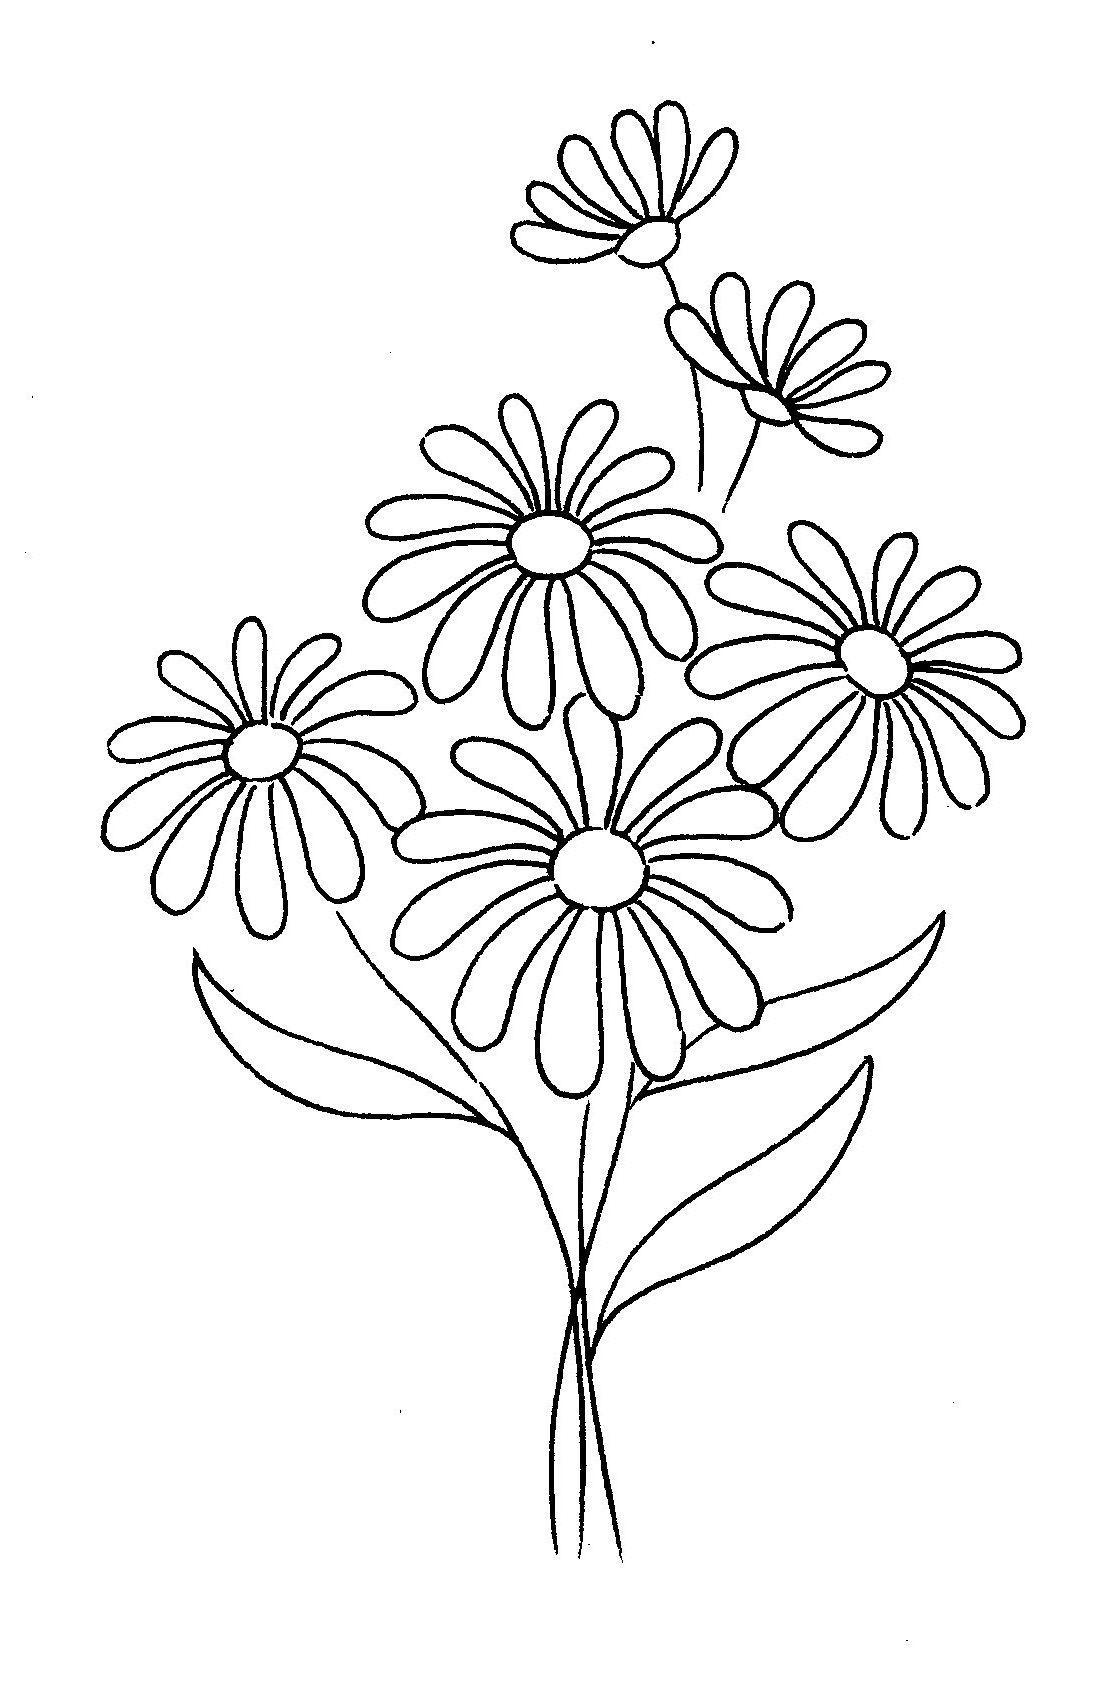 Flower Line Drawing Tumblr : Daisy flower sketch pixshark images galleries